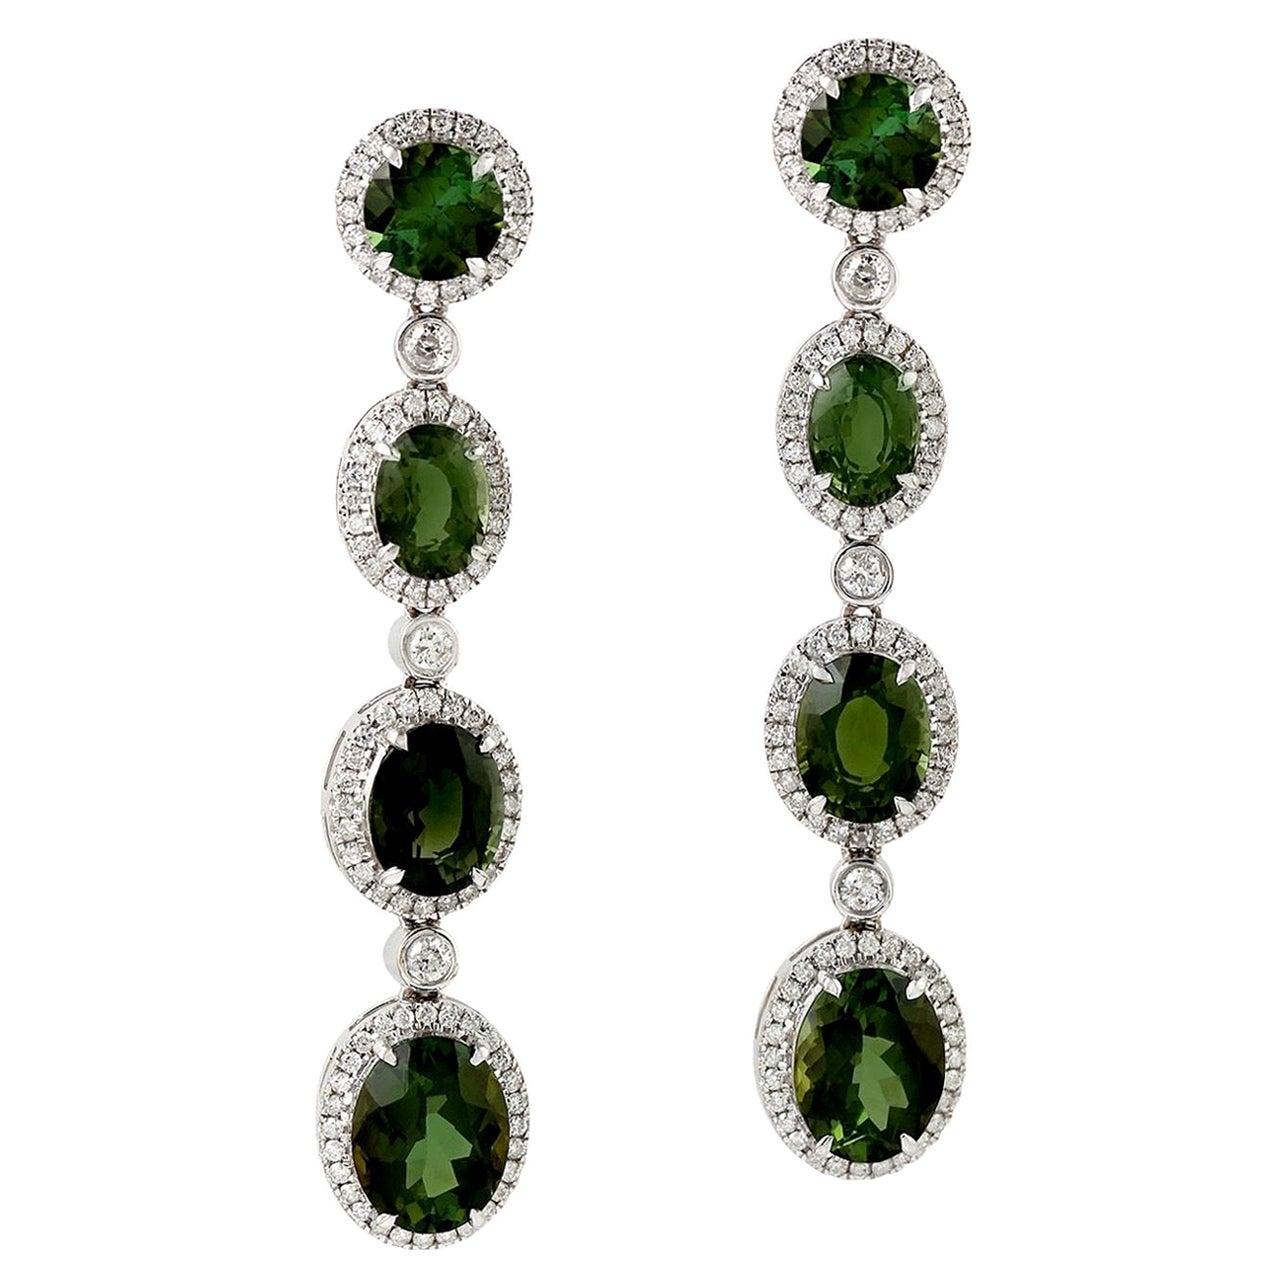 10.86 Carat Green Tourmaline Diamond 18 Karat Gold Earrings